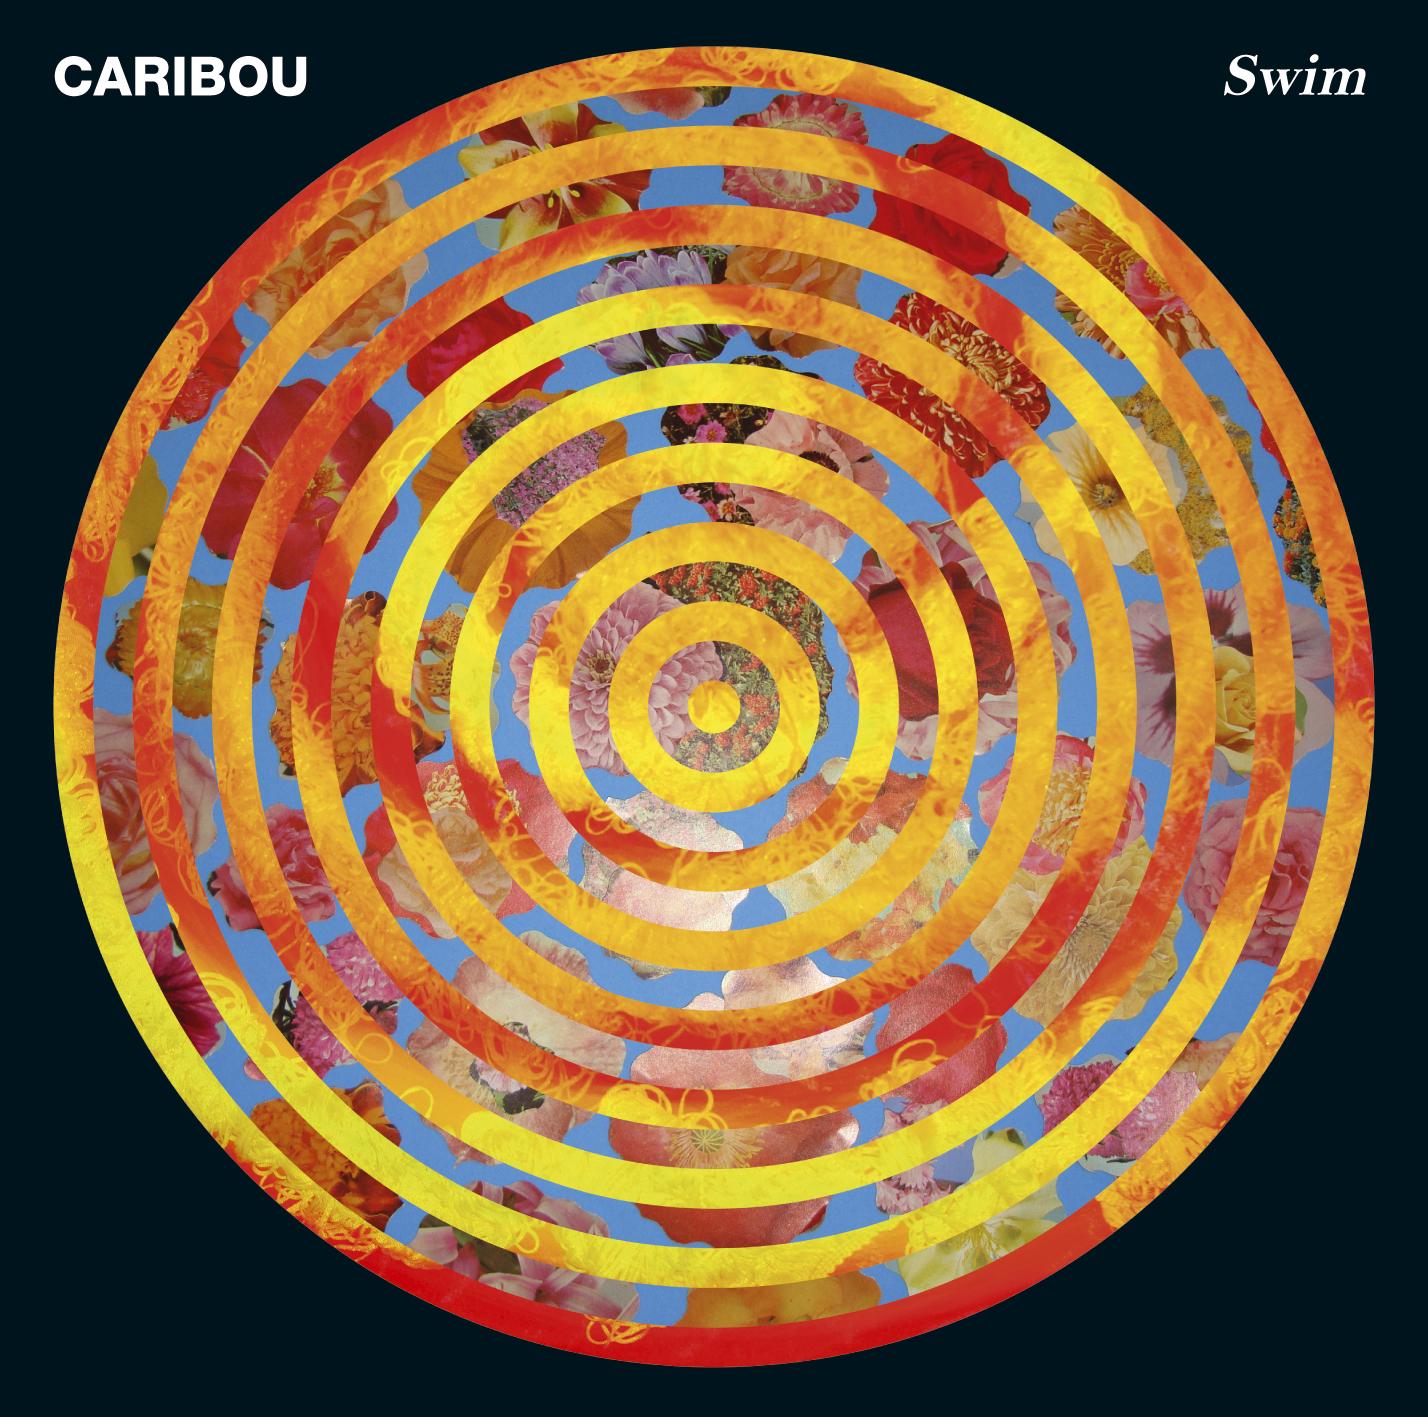 Caribou, Bron: soundnotseen.com